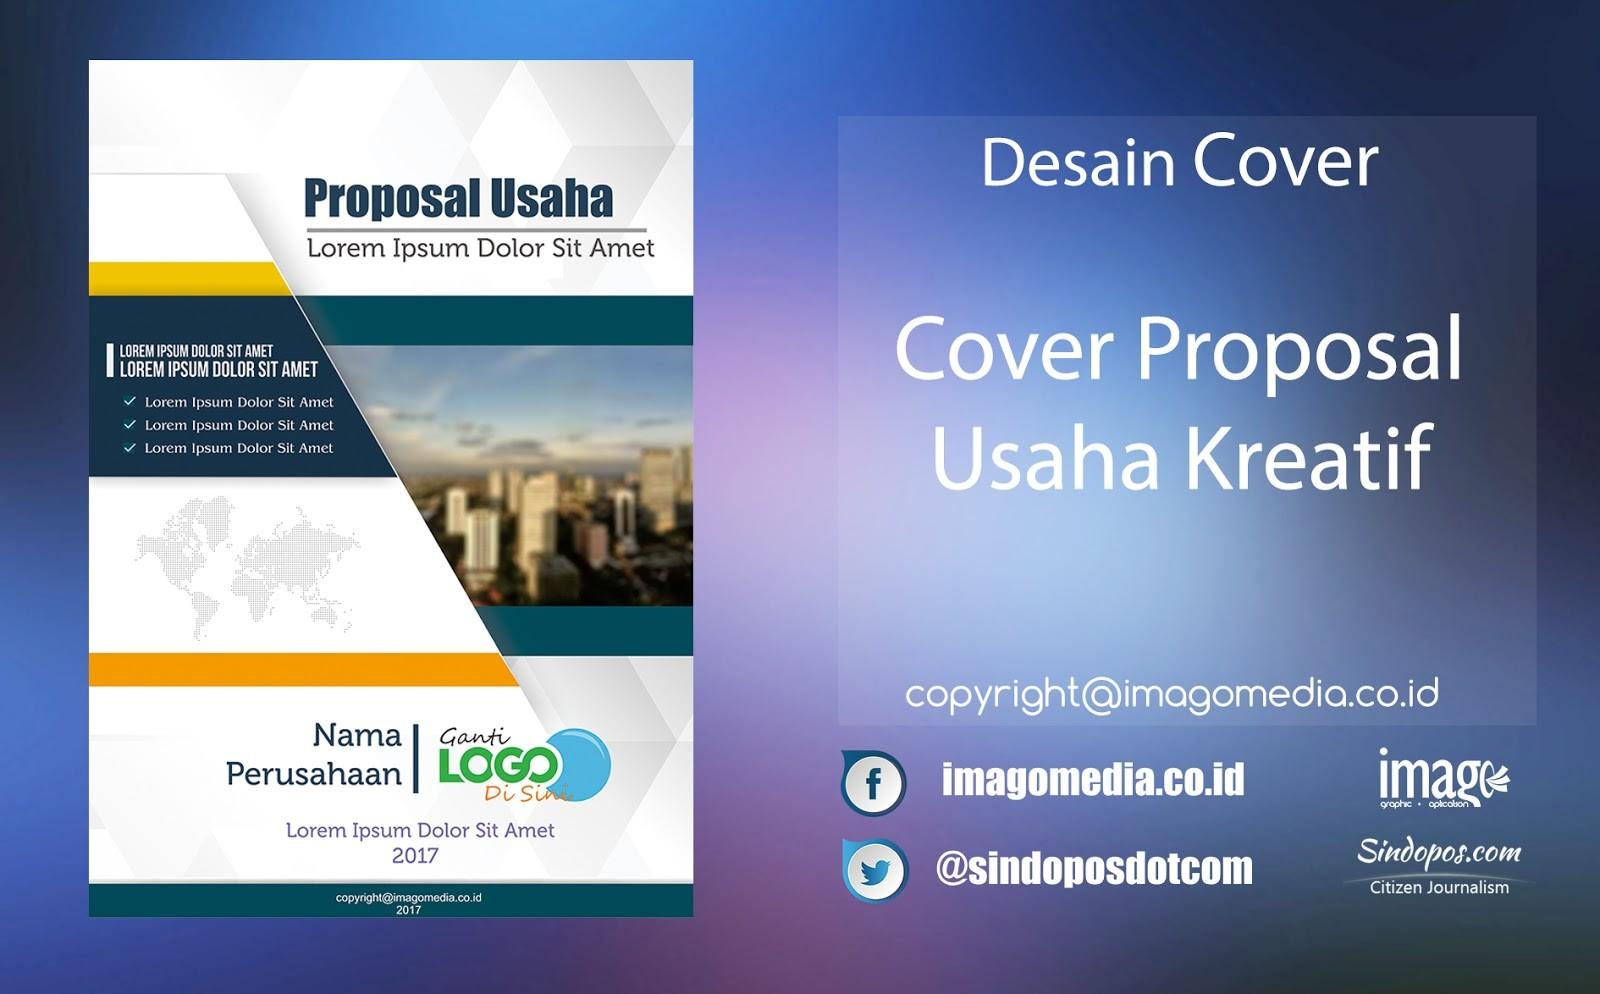 download template proposal kreatif gratis  Contoh Desain Cover Proposal Cdr - Contoh Brends - download template proposal kreatif gratis